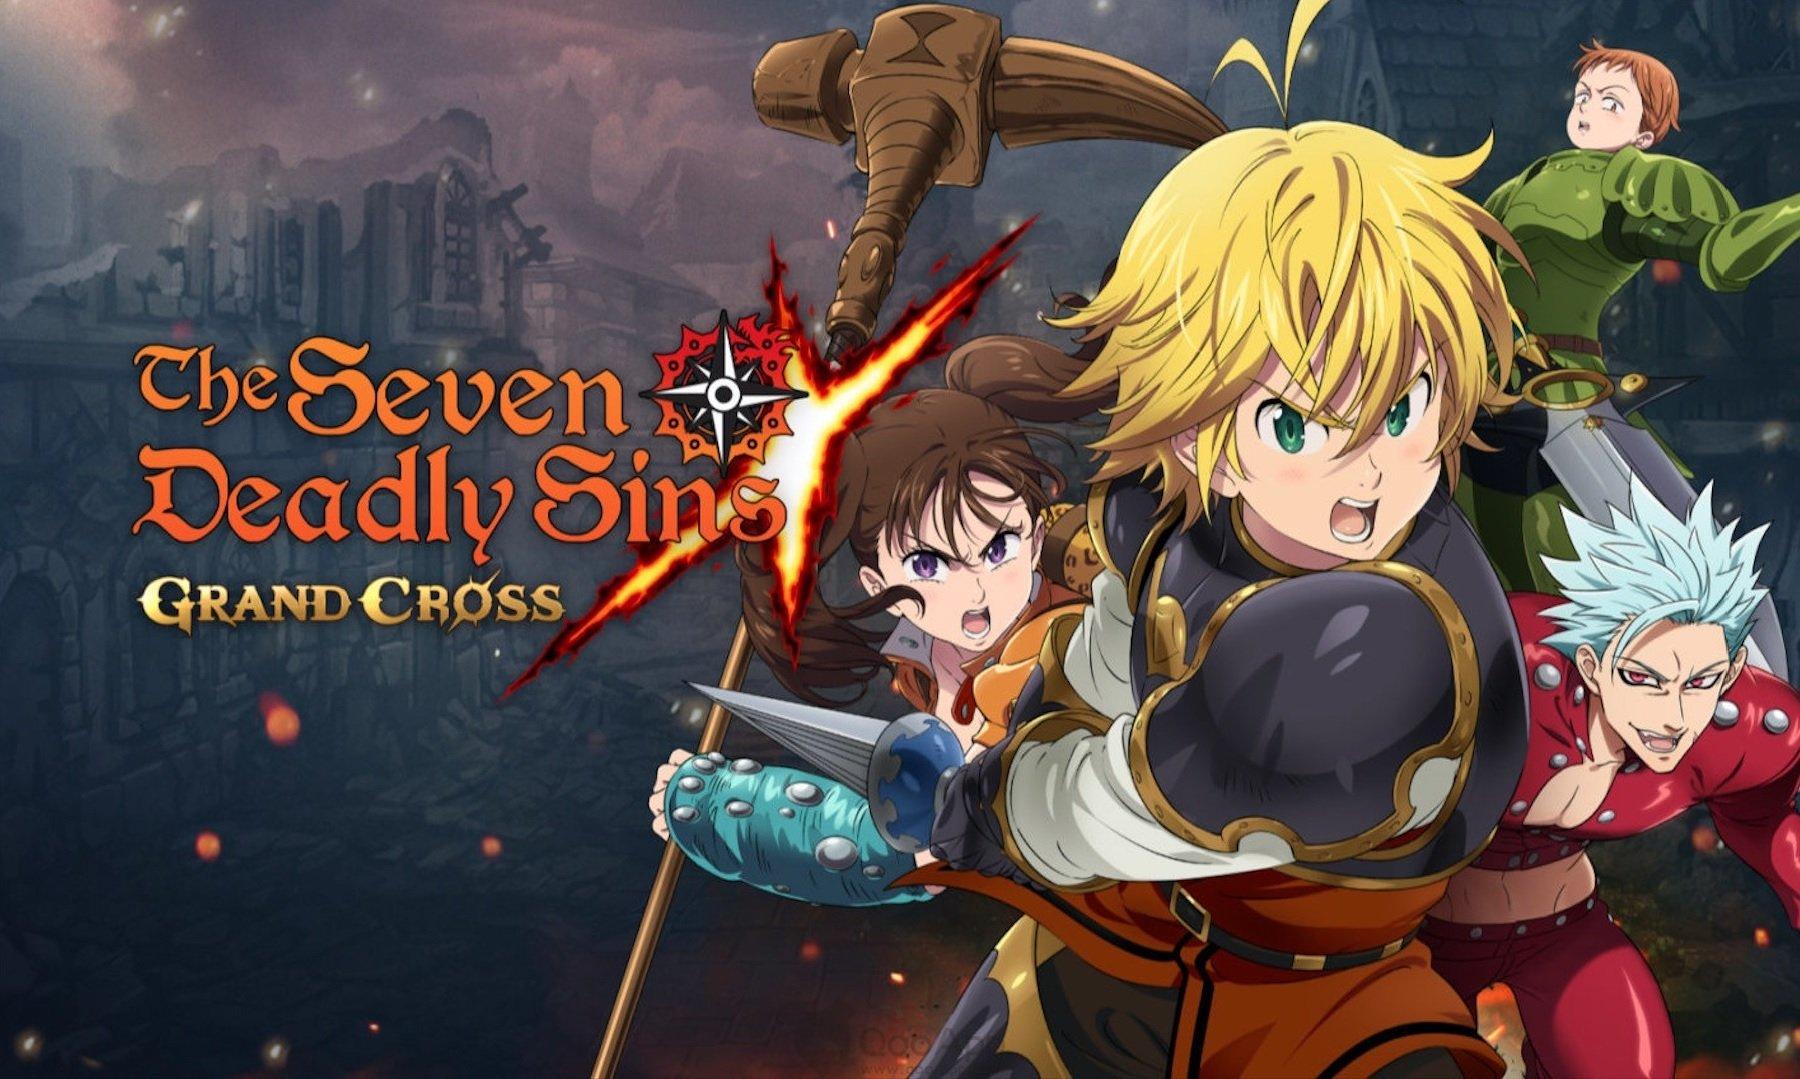 Best team in The Seven Deadly Sins: Grand Cross